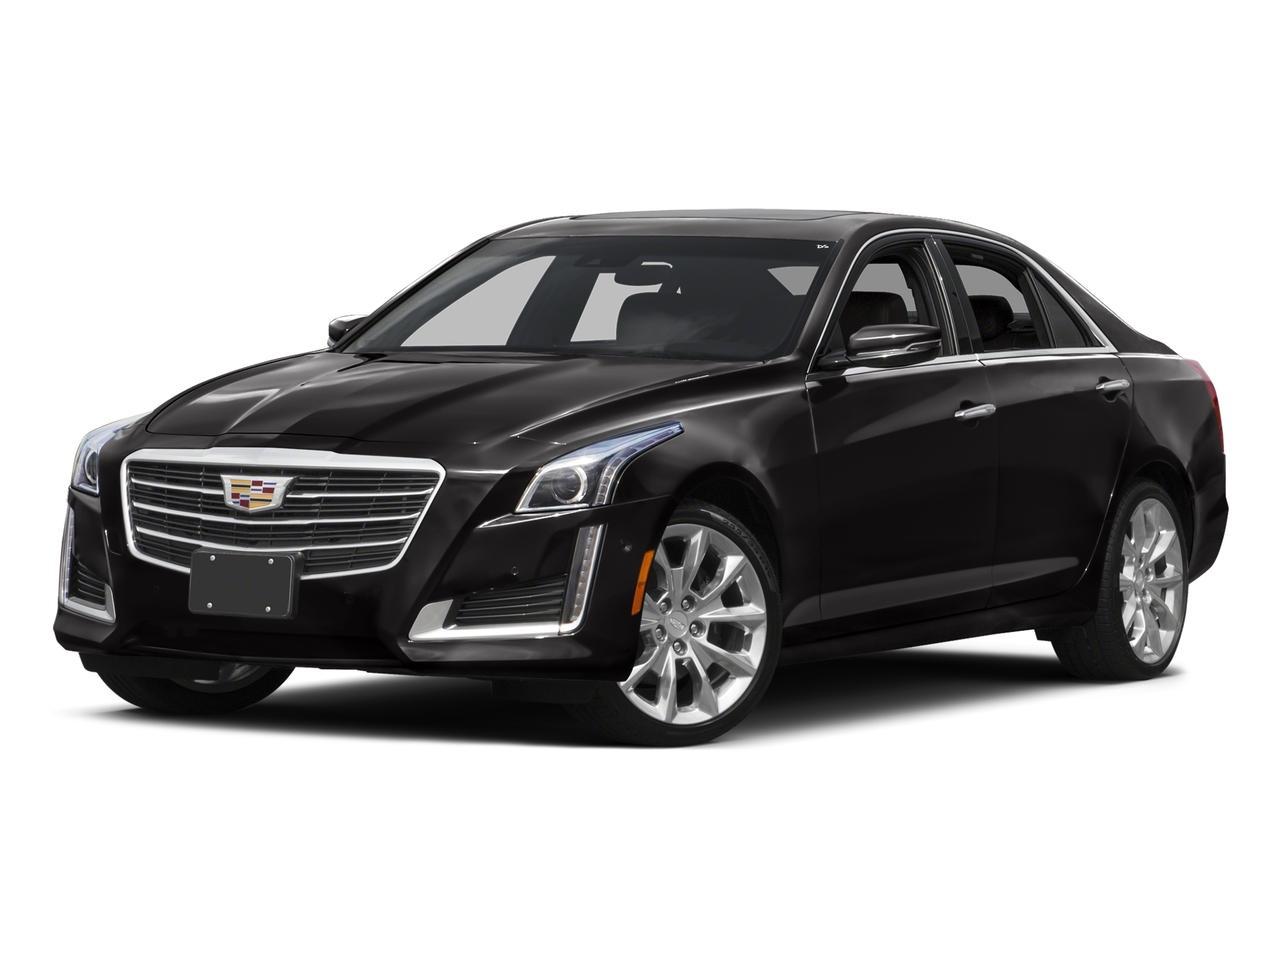 2016 Cadillac CTS Sedan Vehicle Photo in Ocala, FL 34474